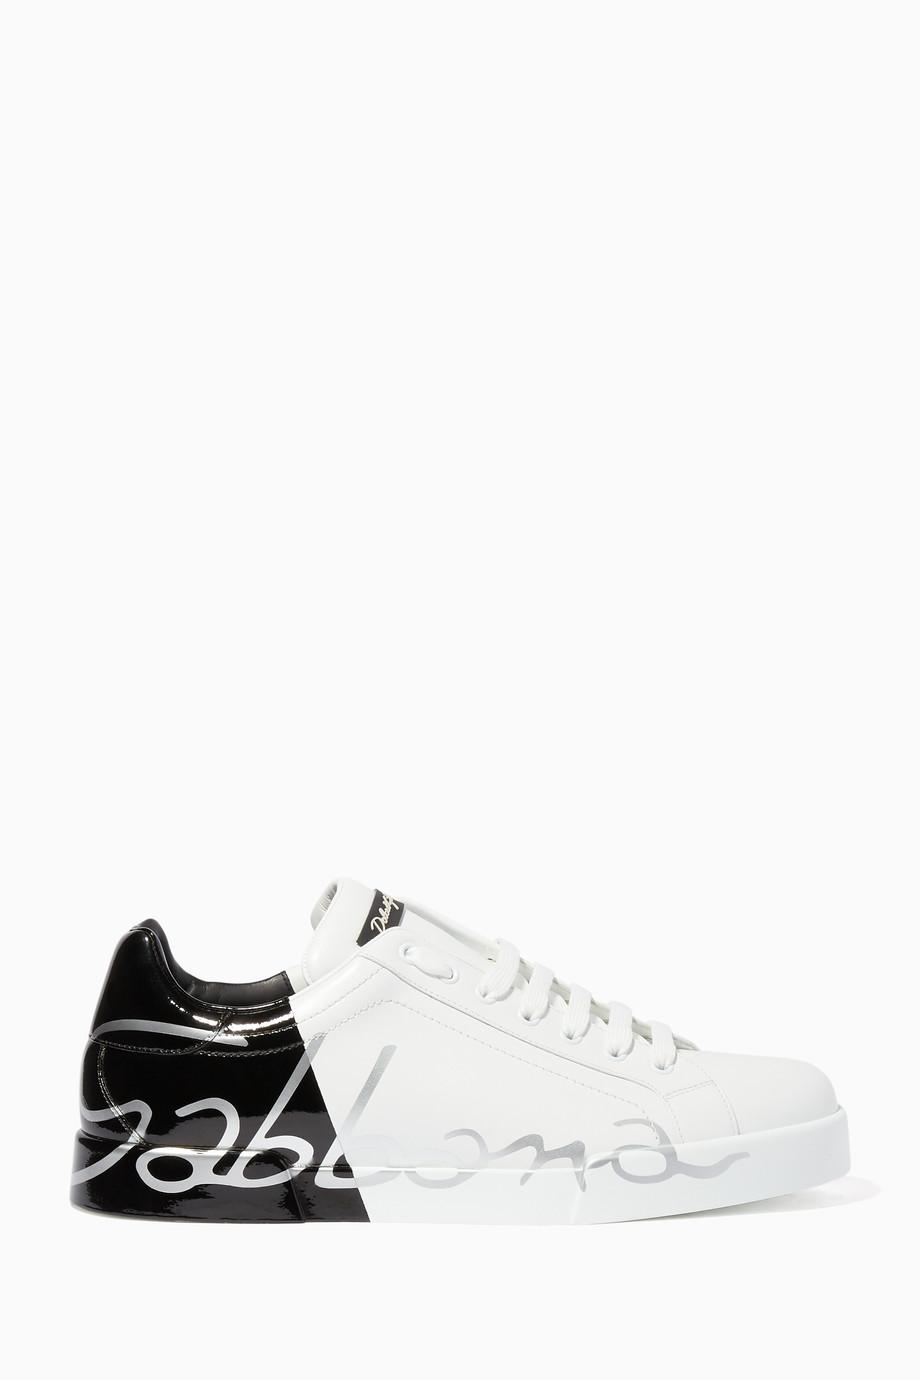 7cf1ef6b4 تسوق حذاء سنيكرز بورتوفينو بكعب لامع أبيض وأسود Dolce & Gabbana ابيض ...